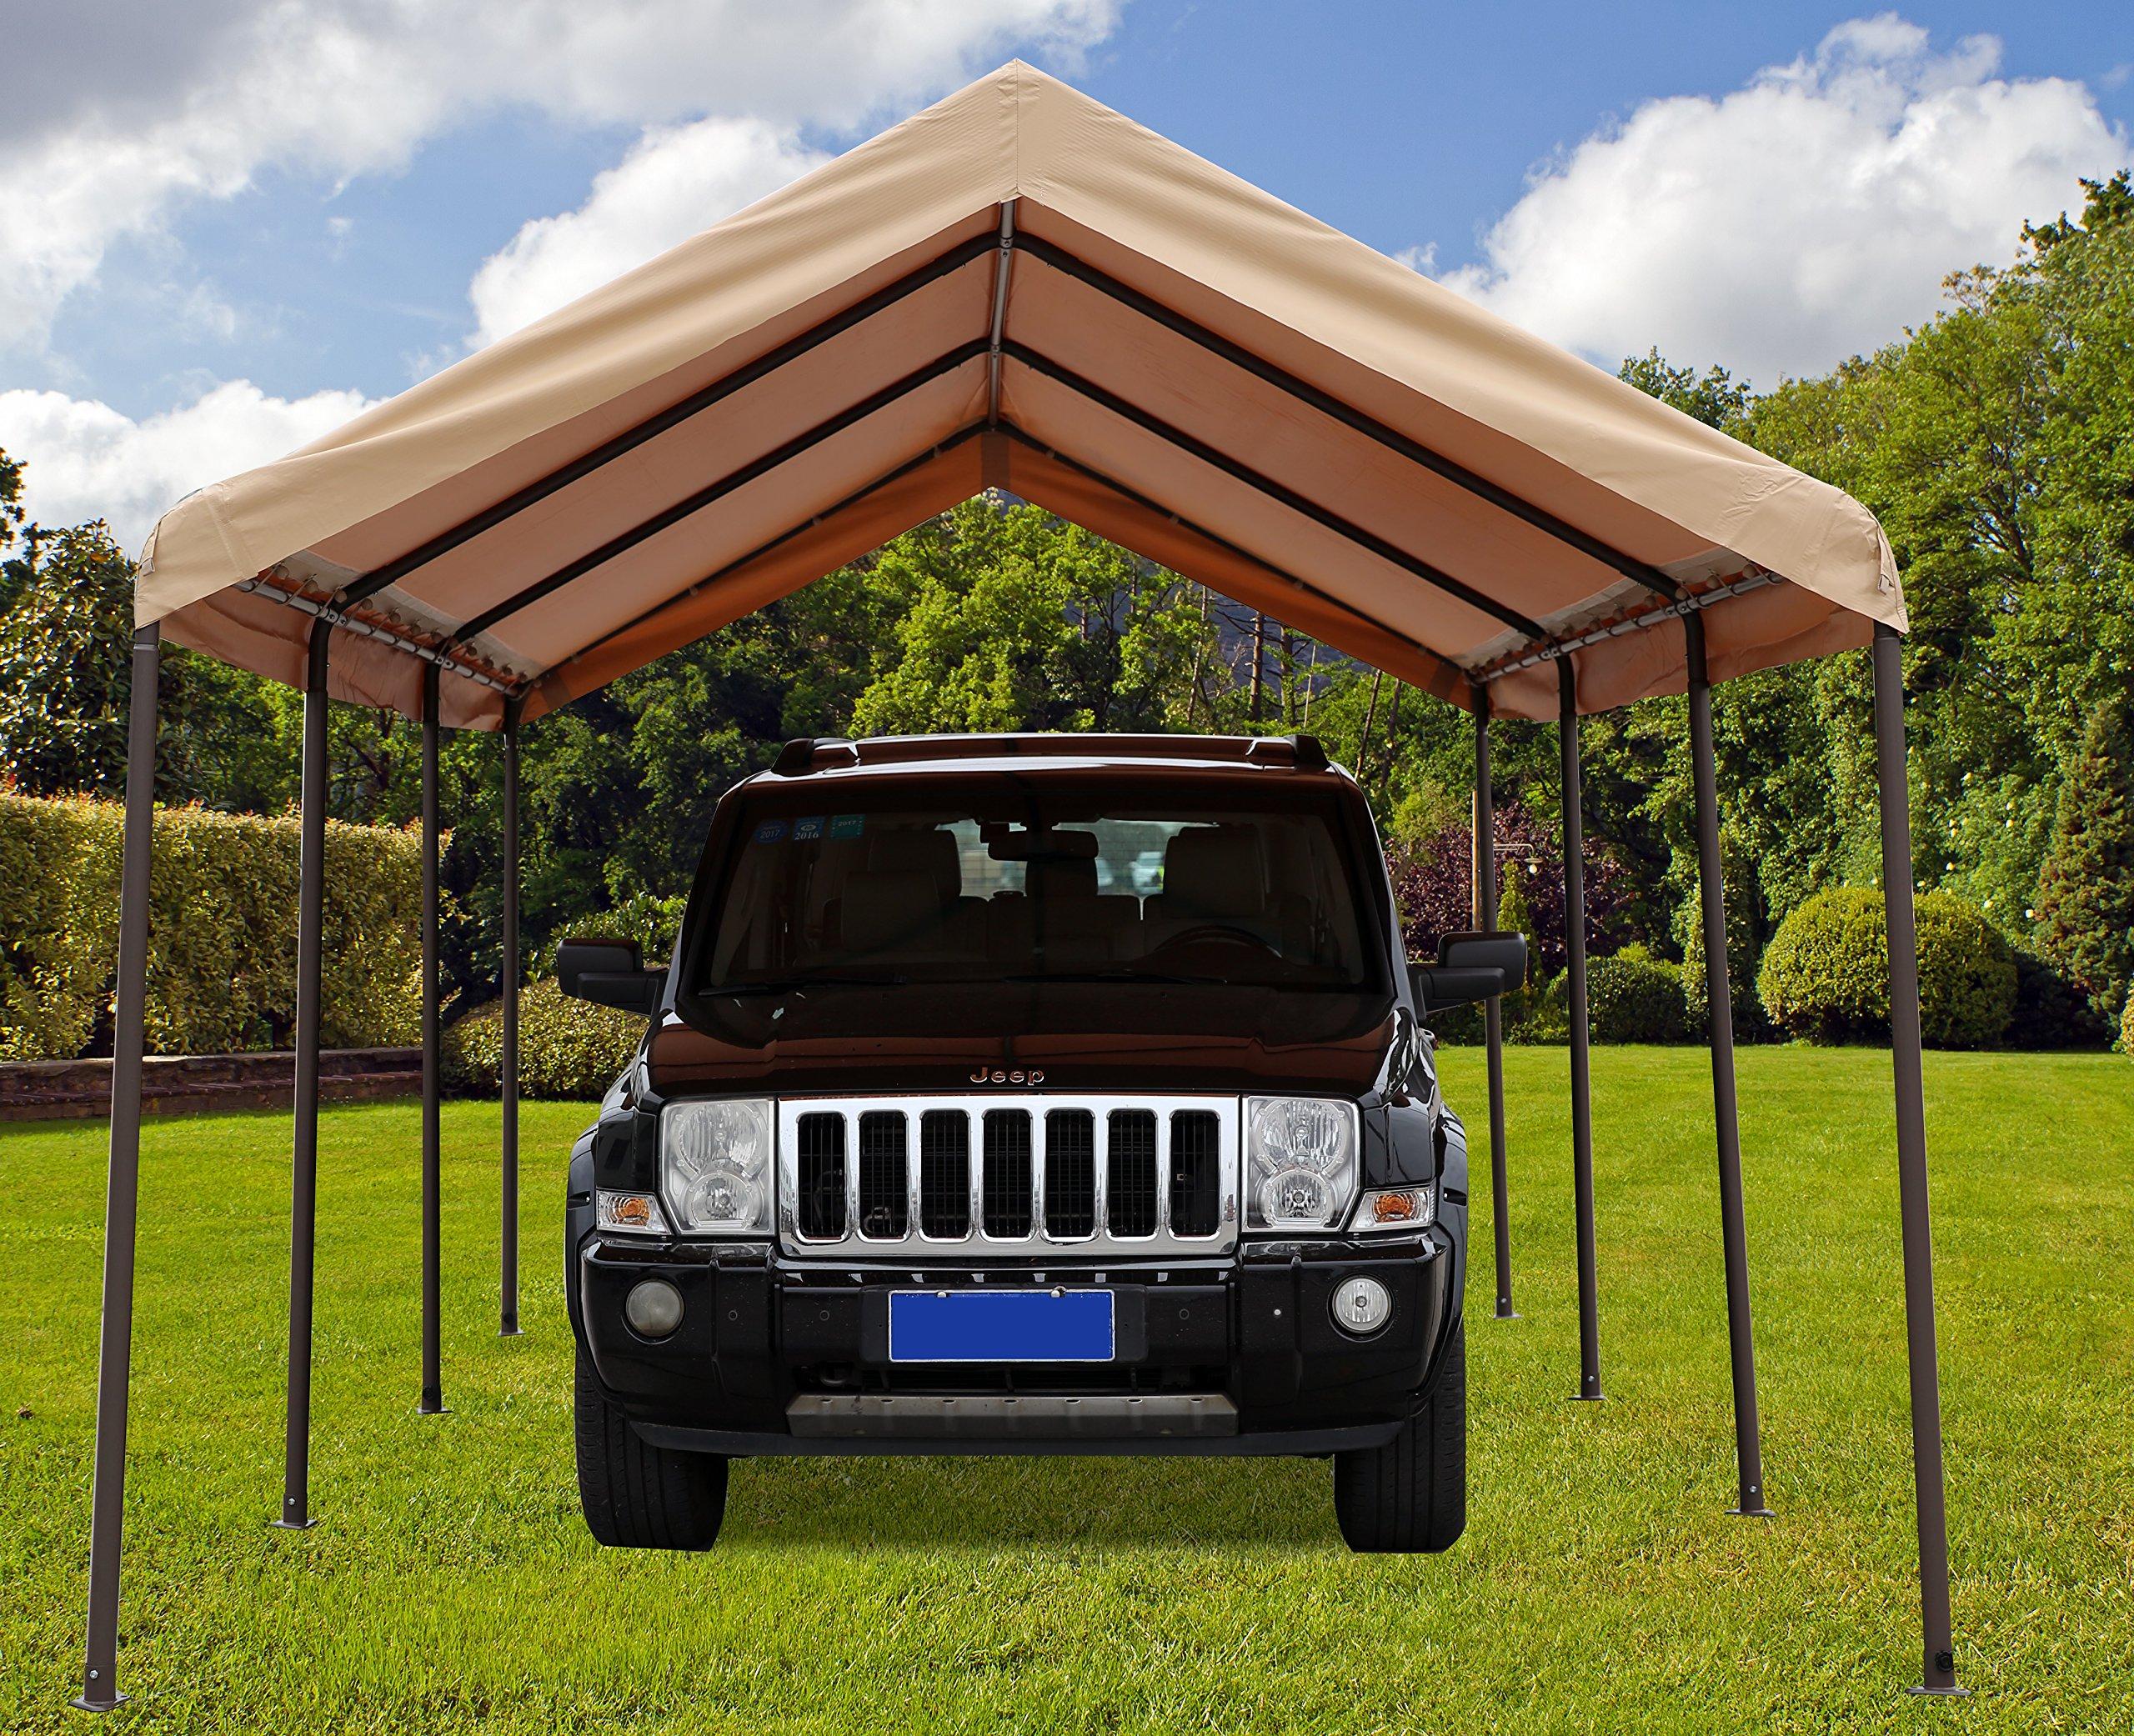 SORARA Carport 10' x 20' Heavy Duty Outdoor All-Purpose Car Canopy Storage Shelter with 8 Steel Legs, Beige by SORARA